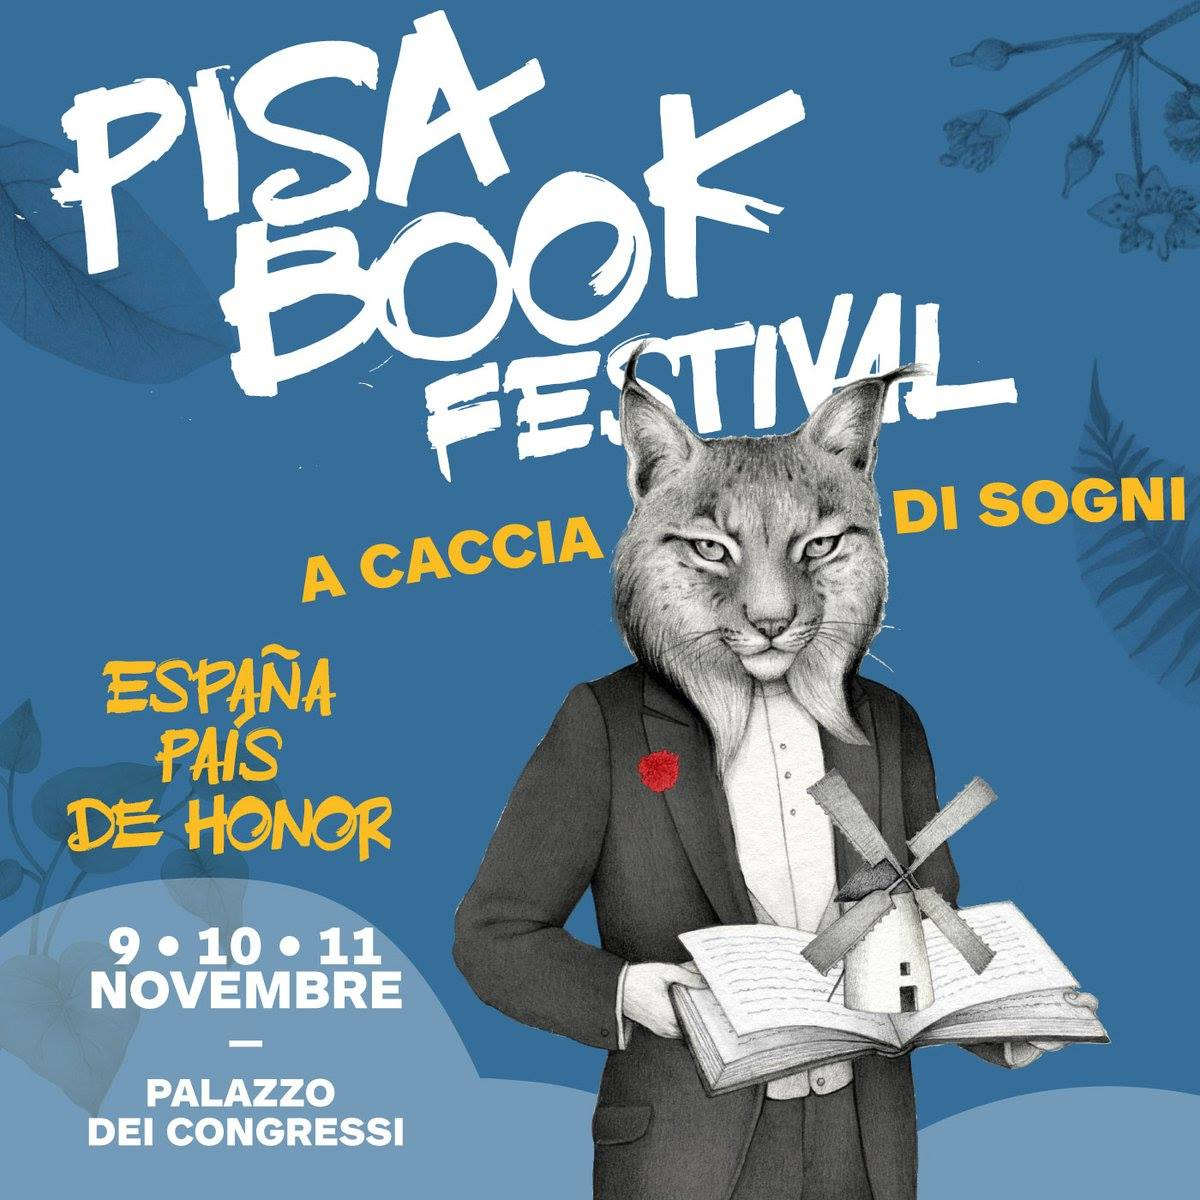 Locandina Pisa Book Festival